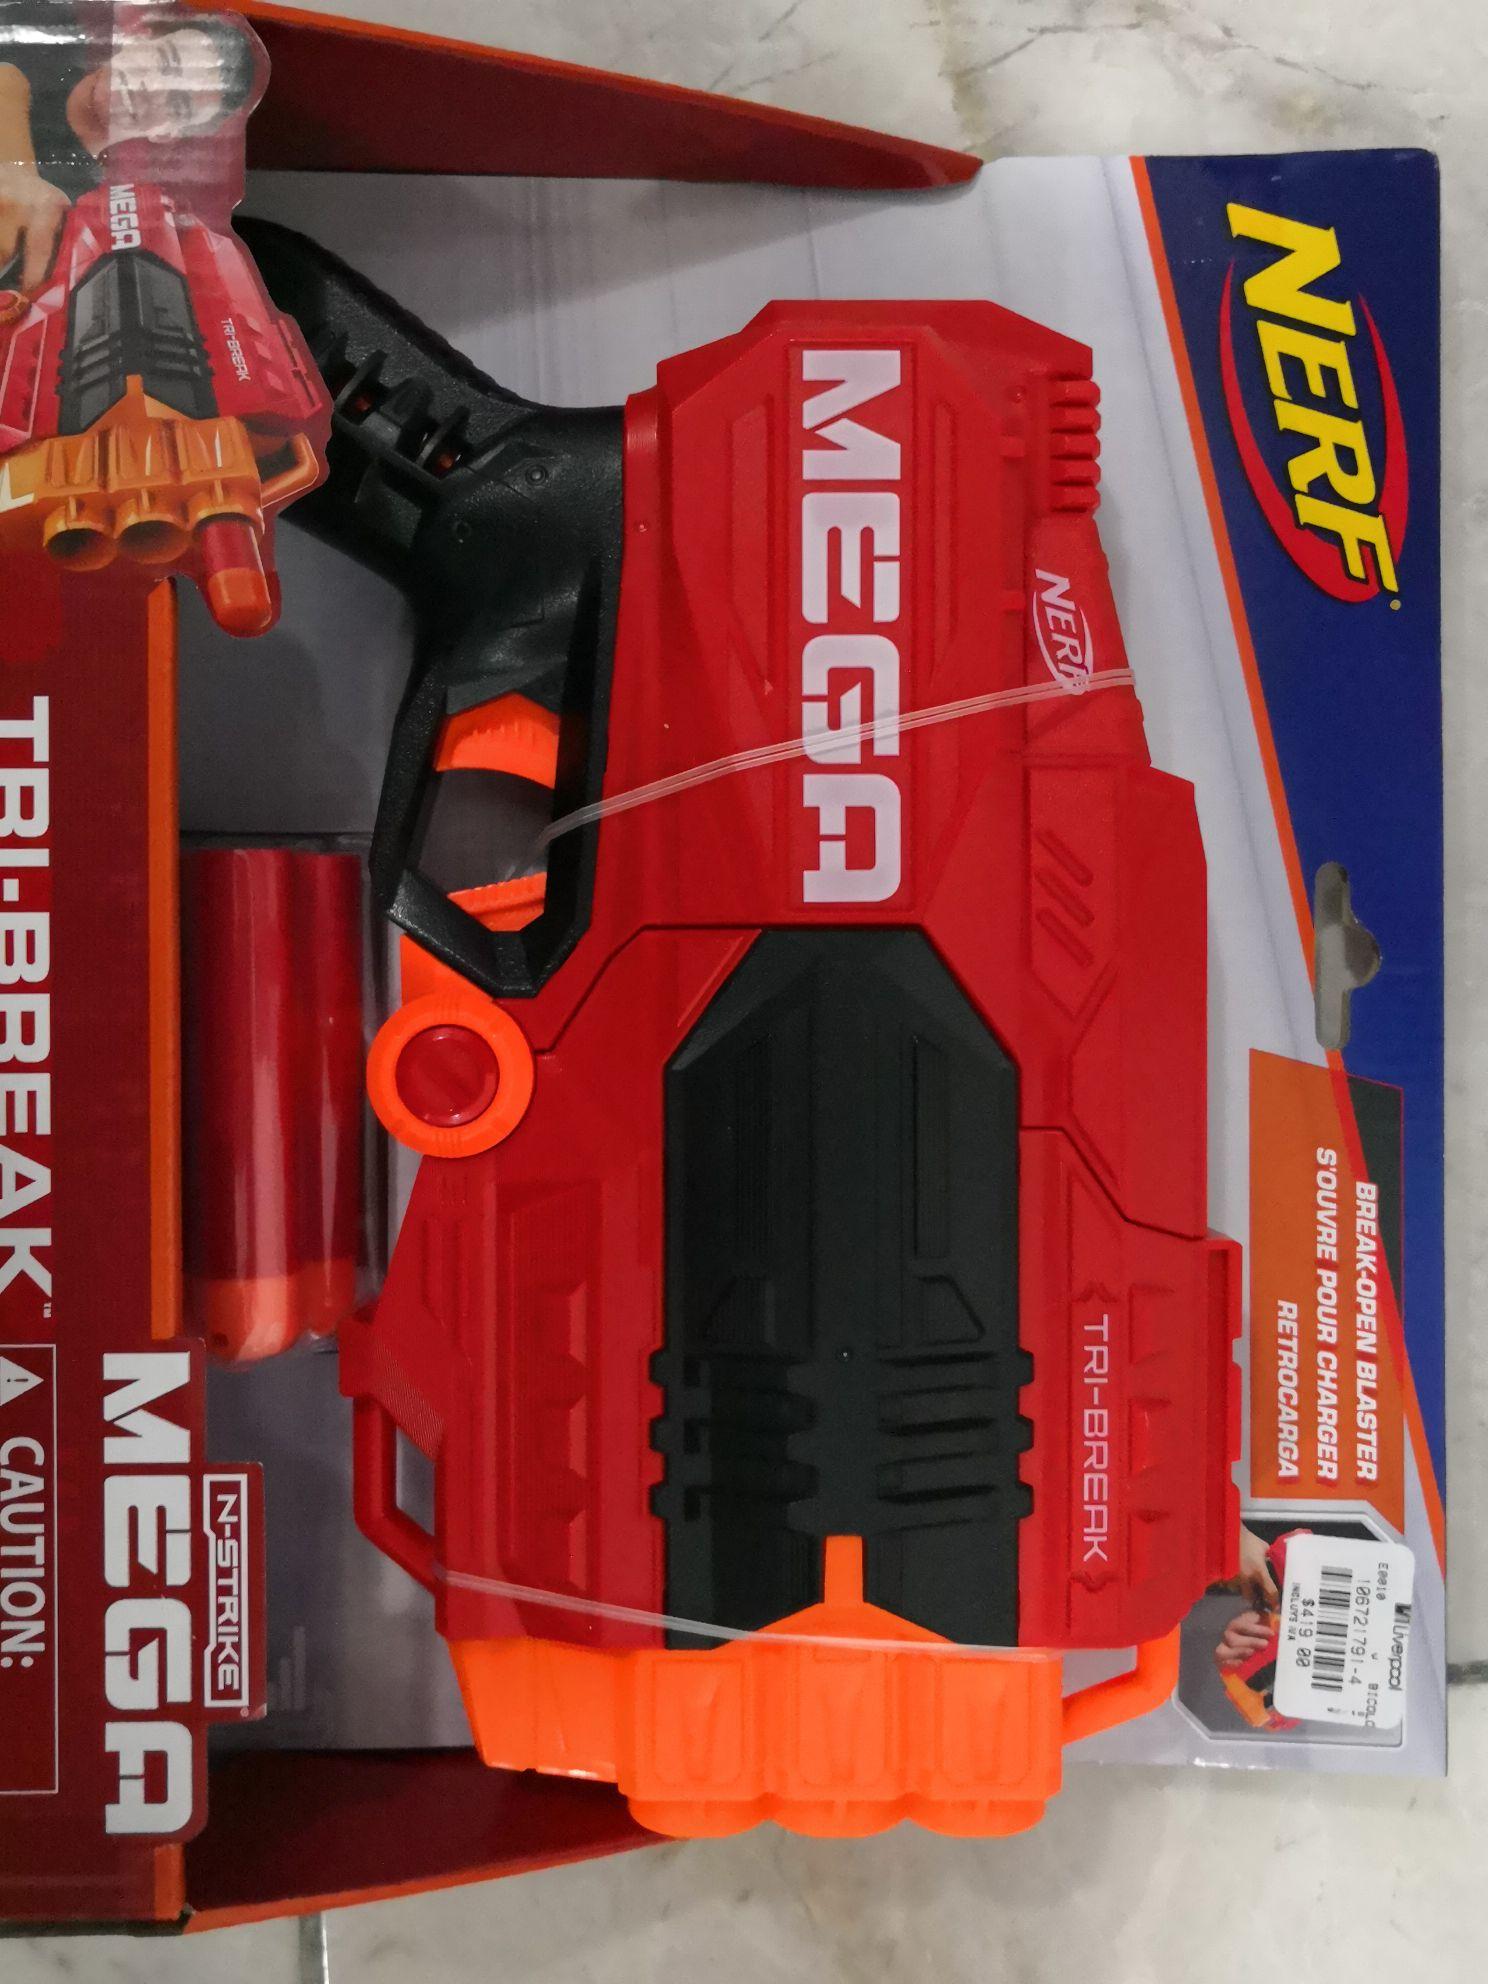 Liverpool Mérida pistola Nerf Tri-break